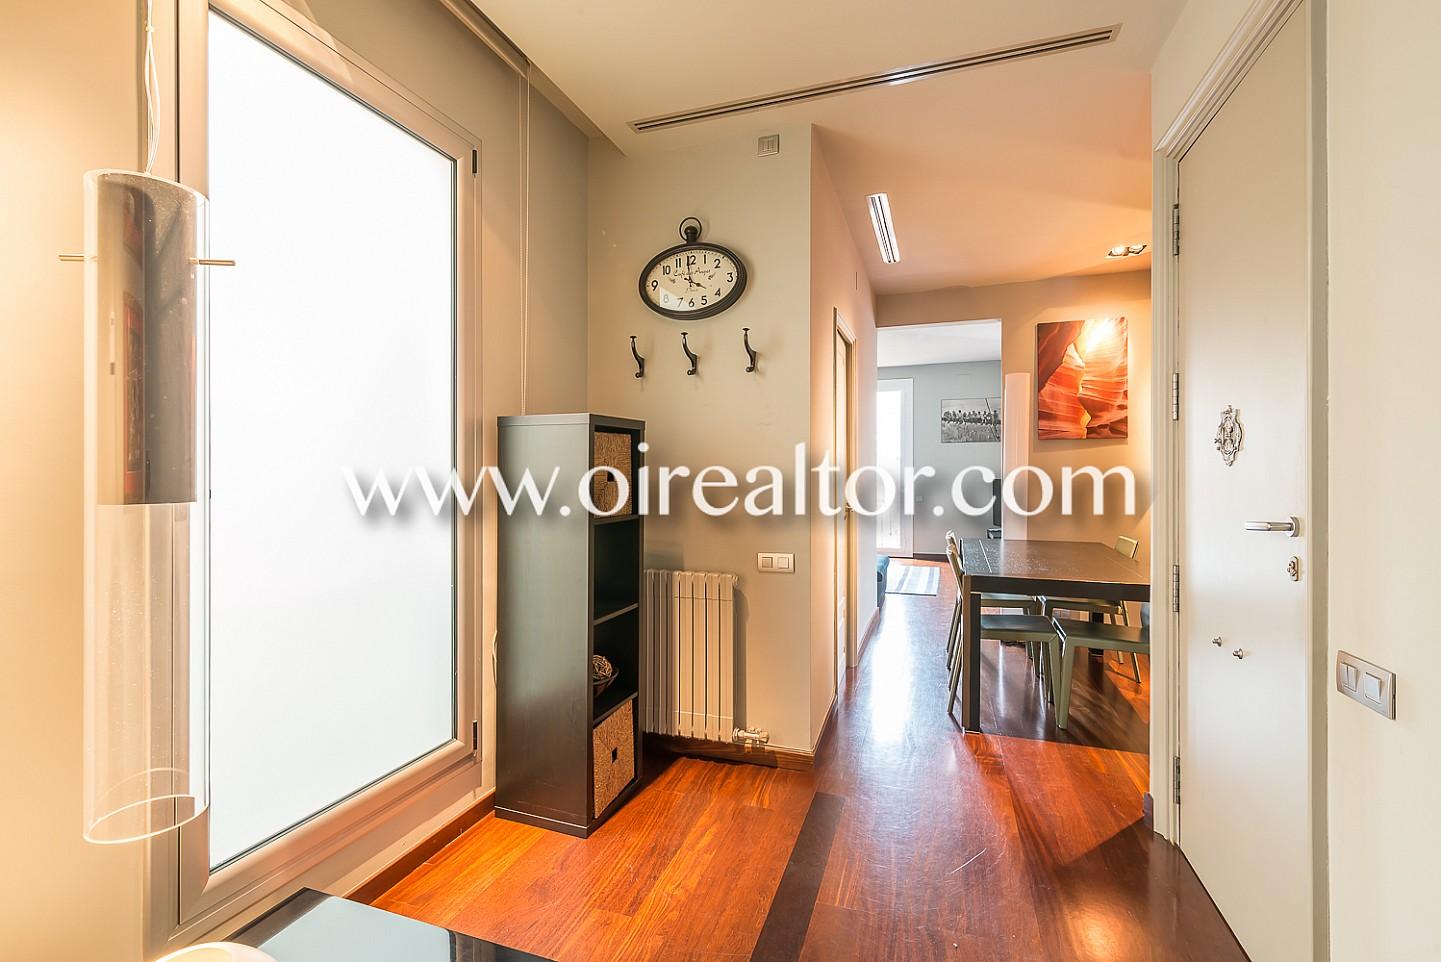 Moderno piso en venta en finca regia del eixample dreta barcelona oi realtor - Pisos eixample ...